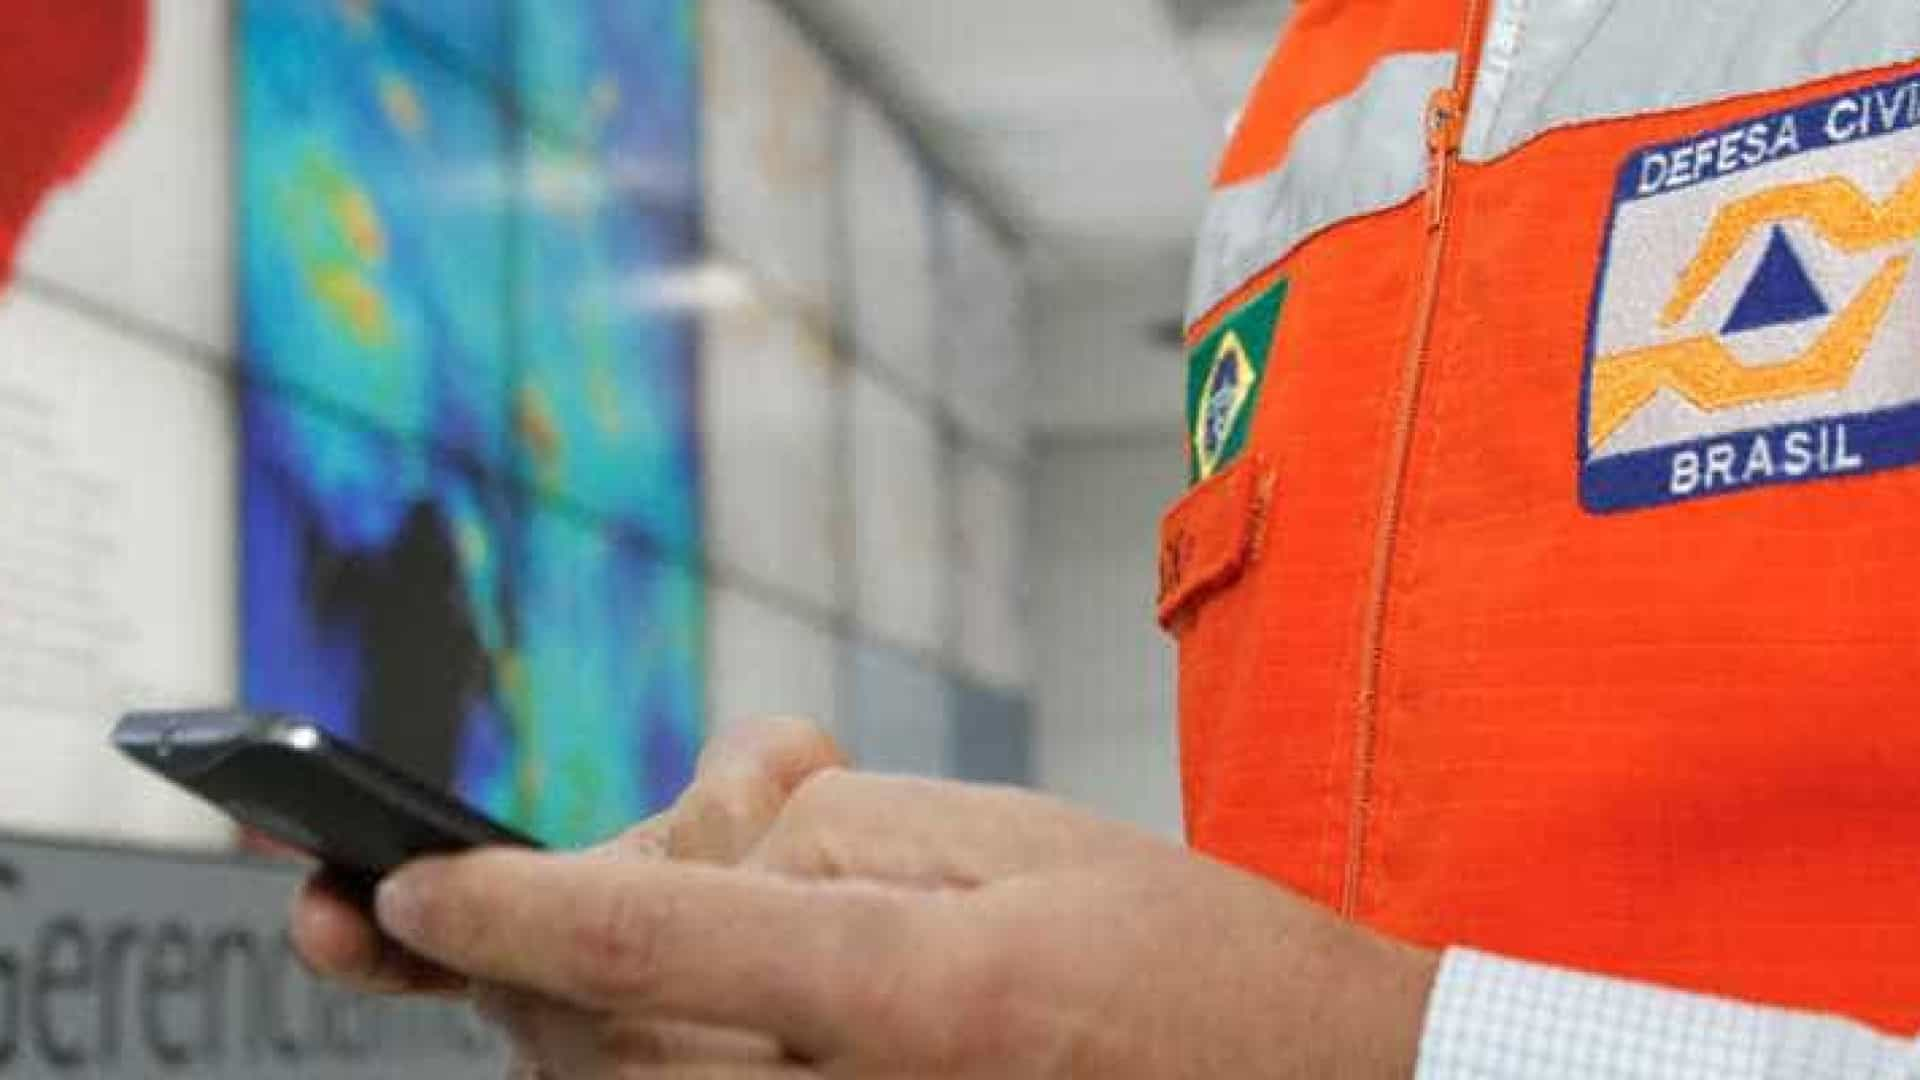 Defesa Civil alerta desastres por SMS